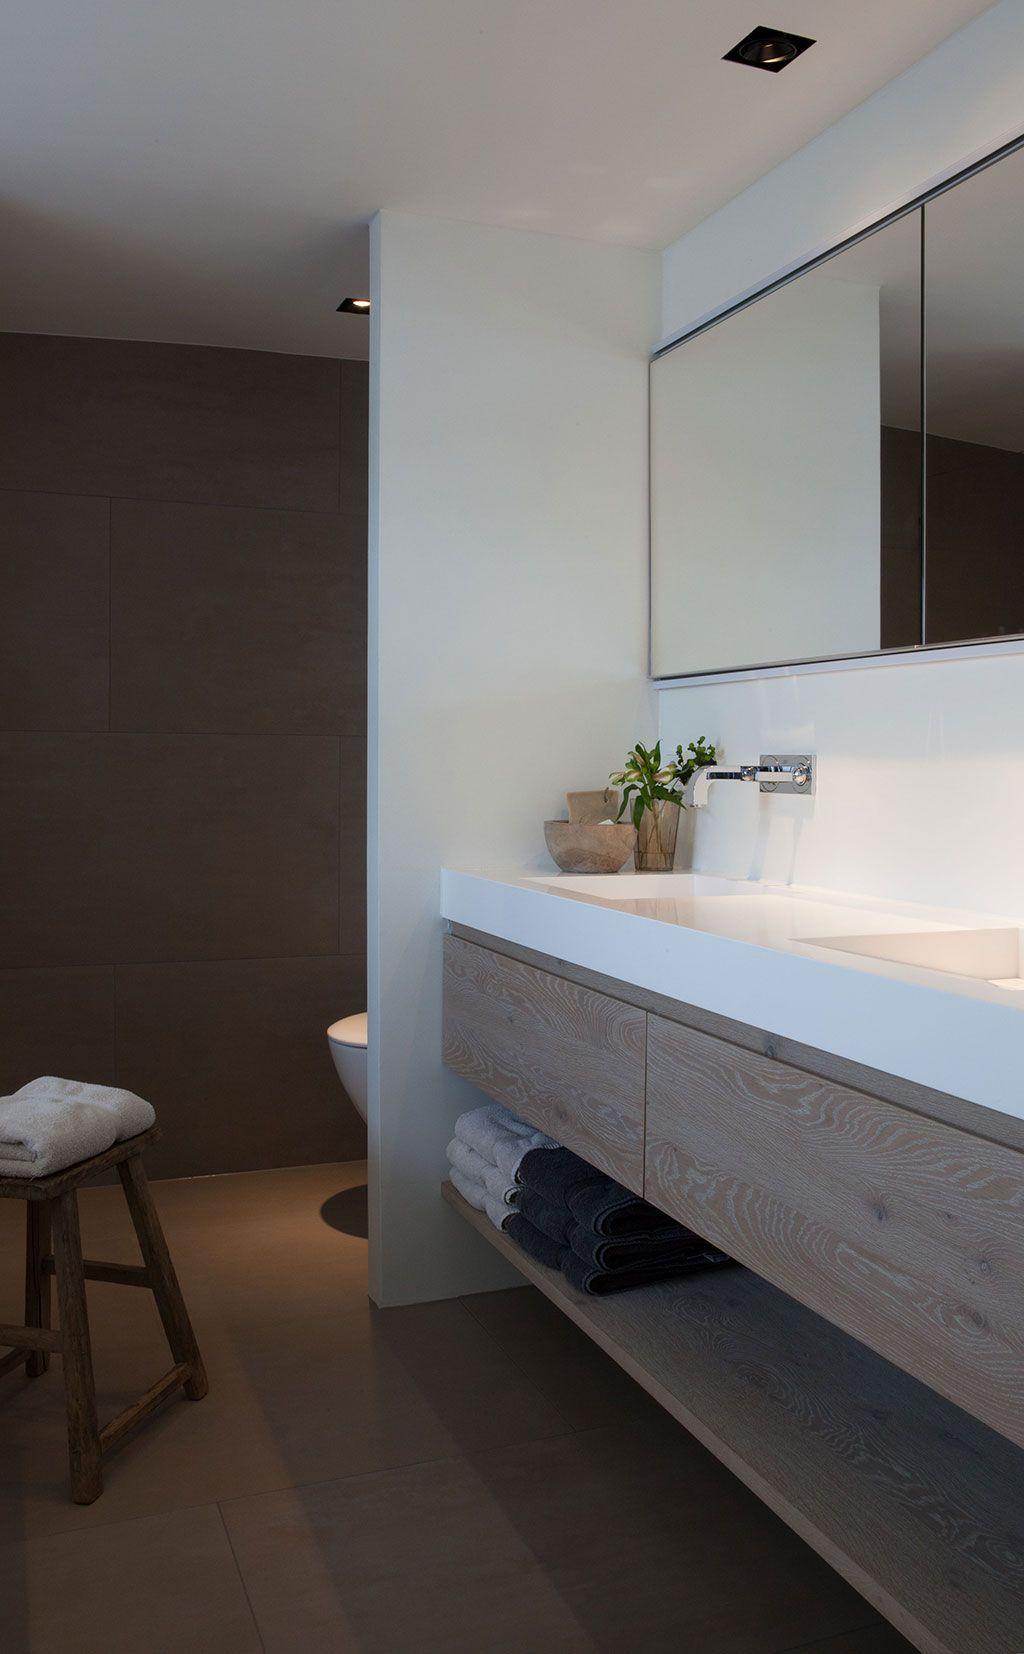 Pin by céline dufresne on salle de bain bathroom pinterest